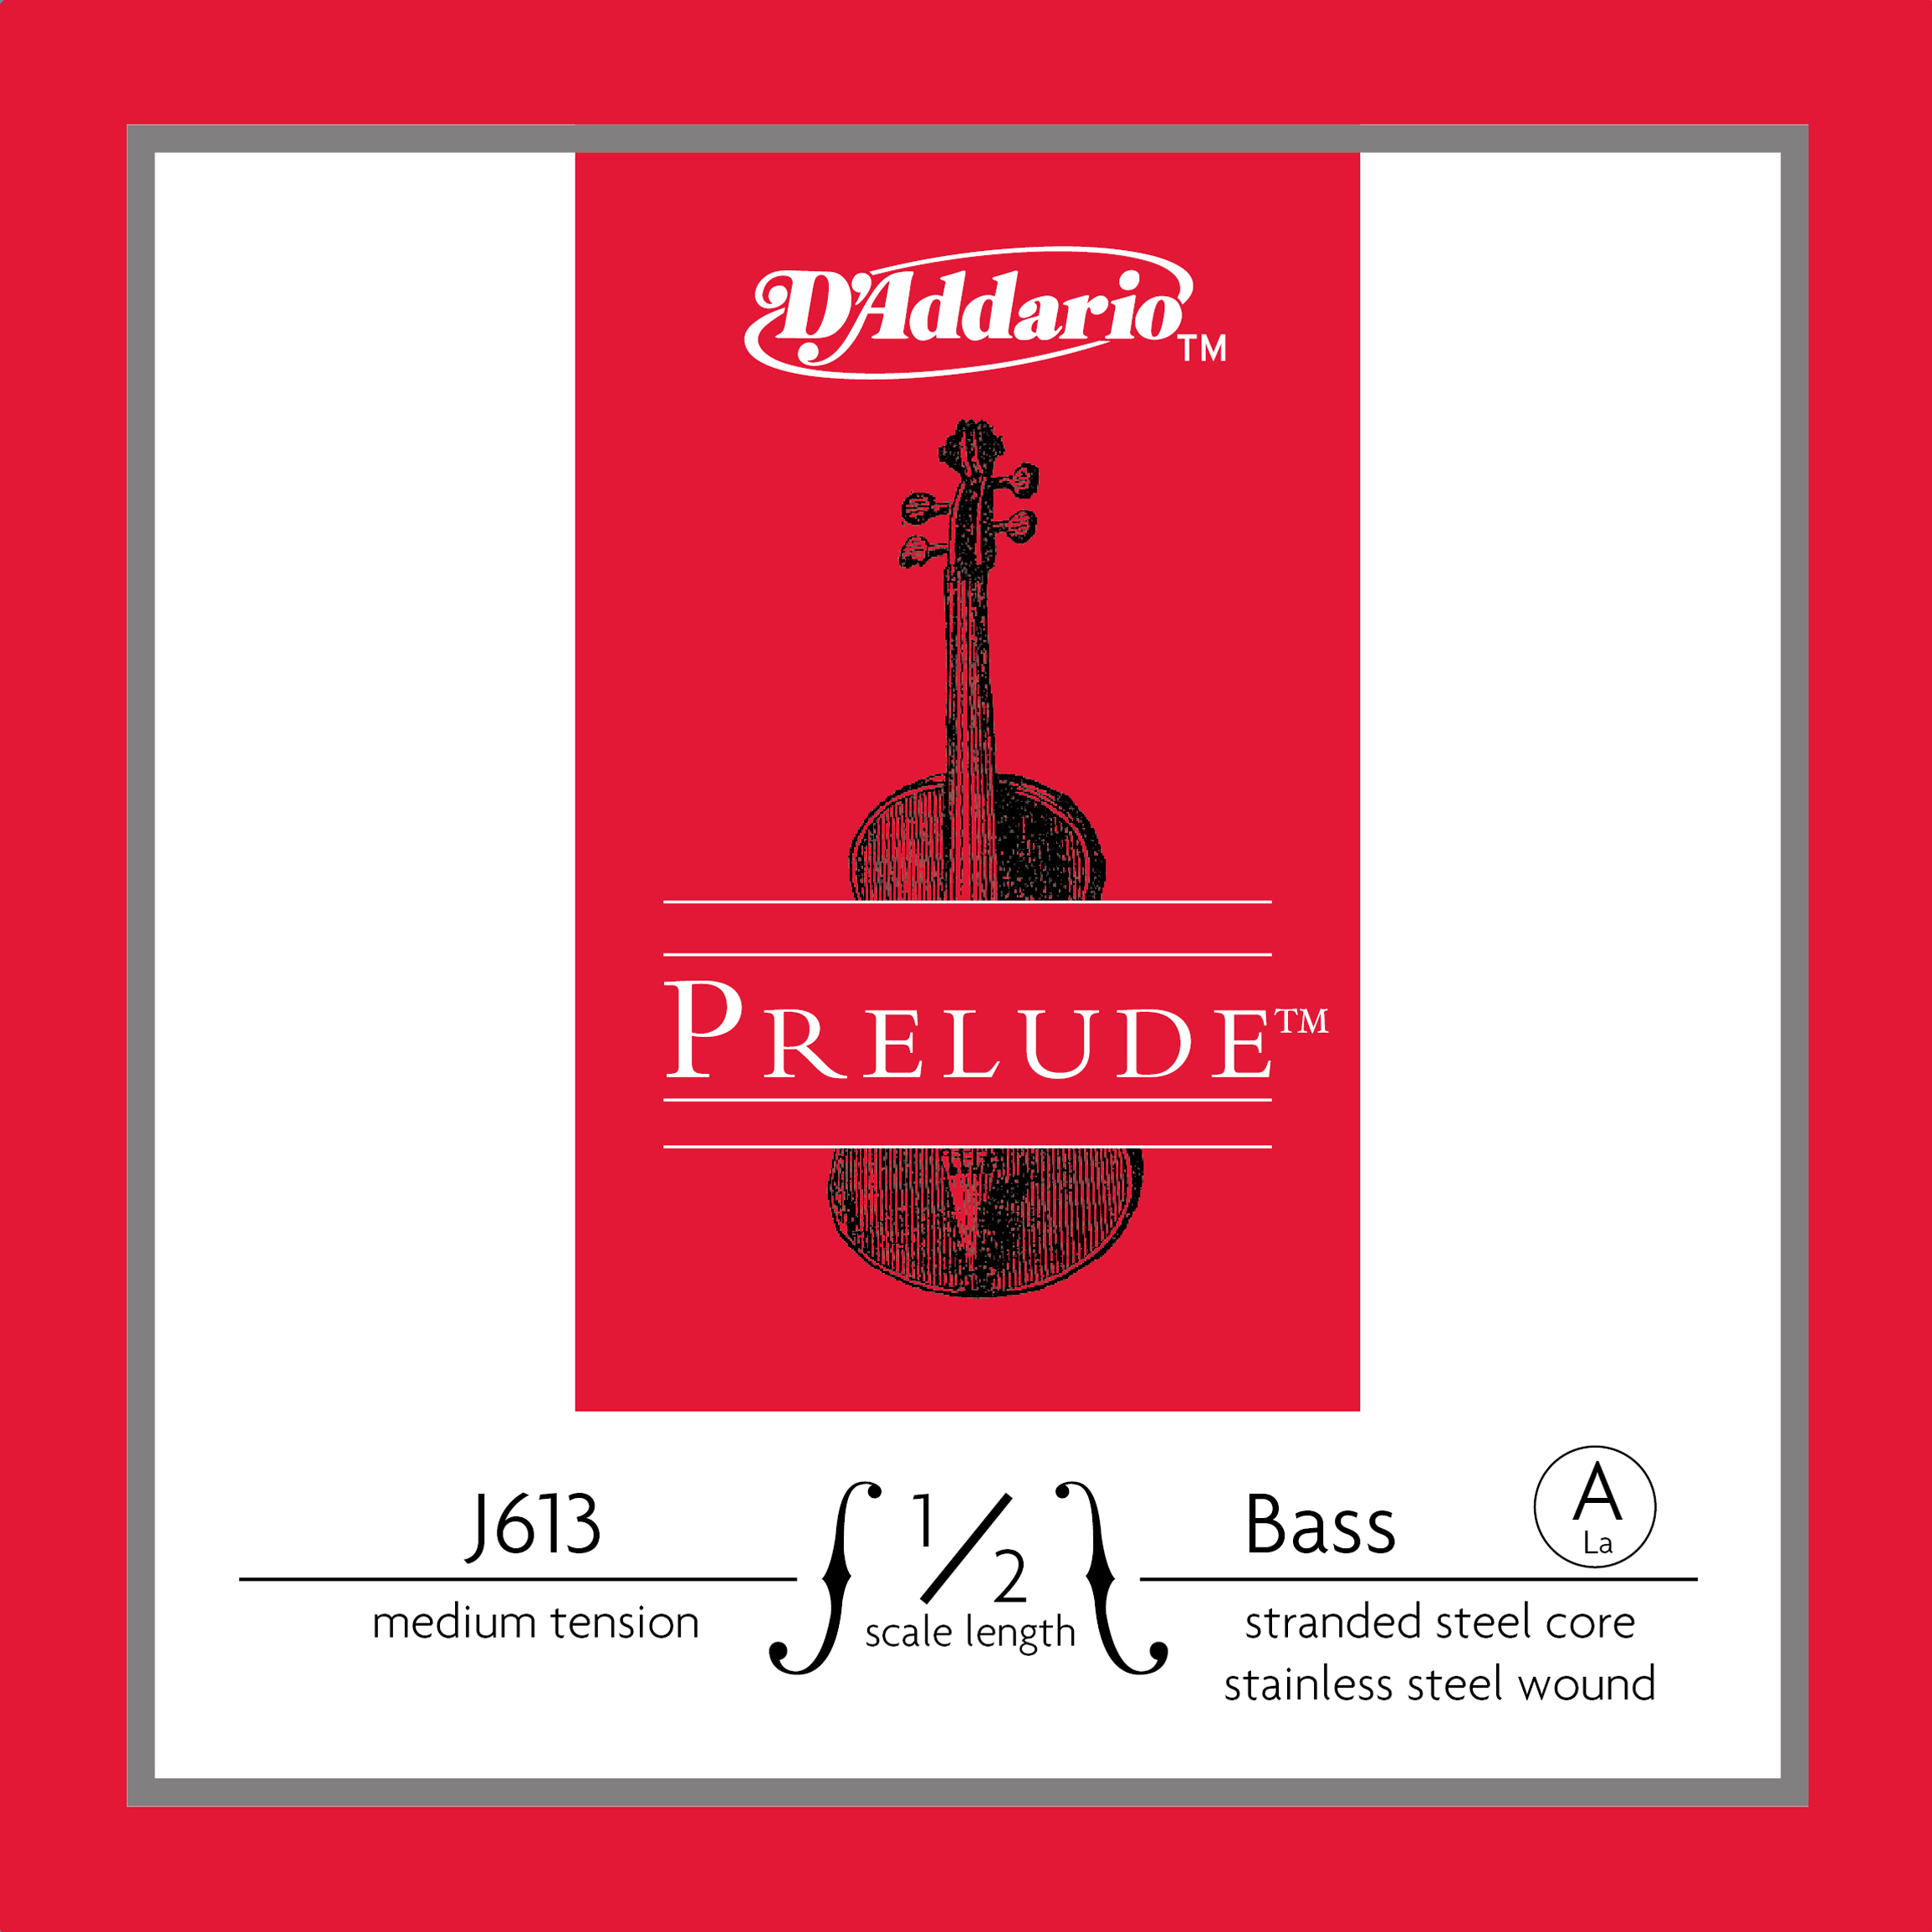 D'Addario Prelude Bass Single A String, 1/2 Scale, Medium Tension